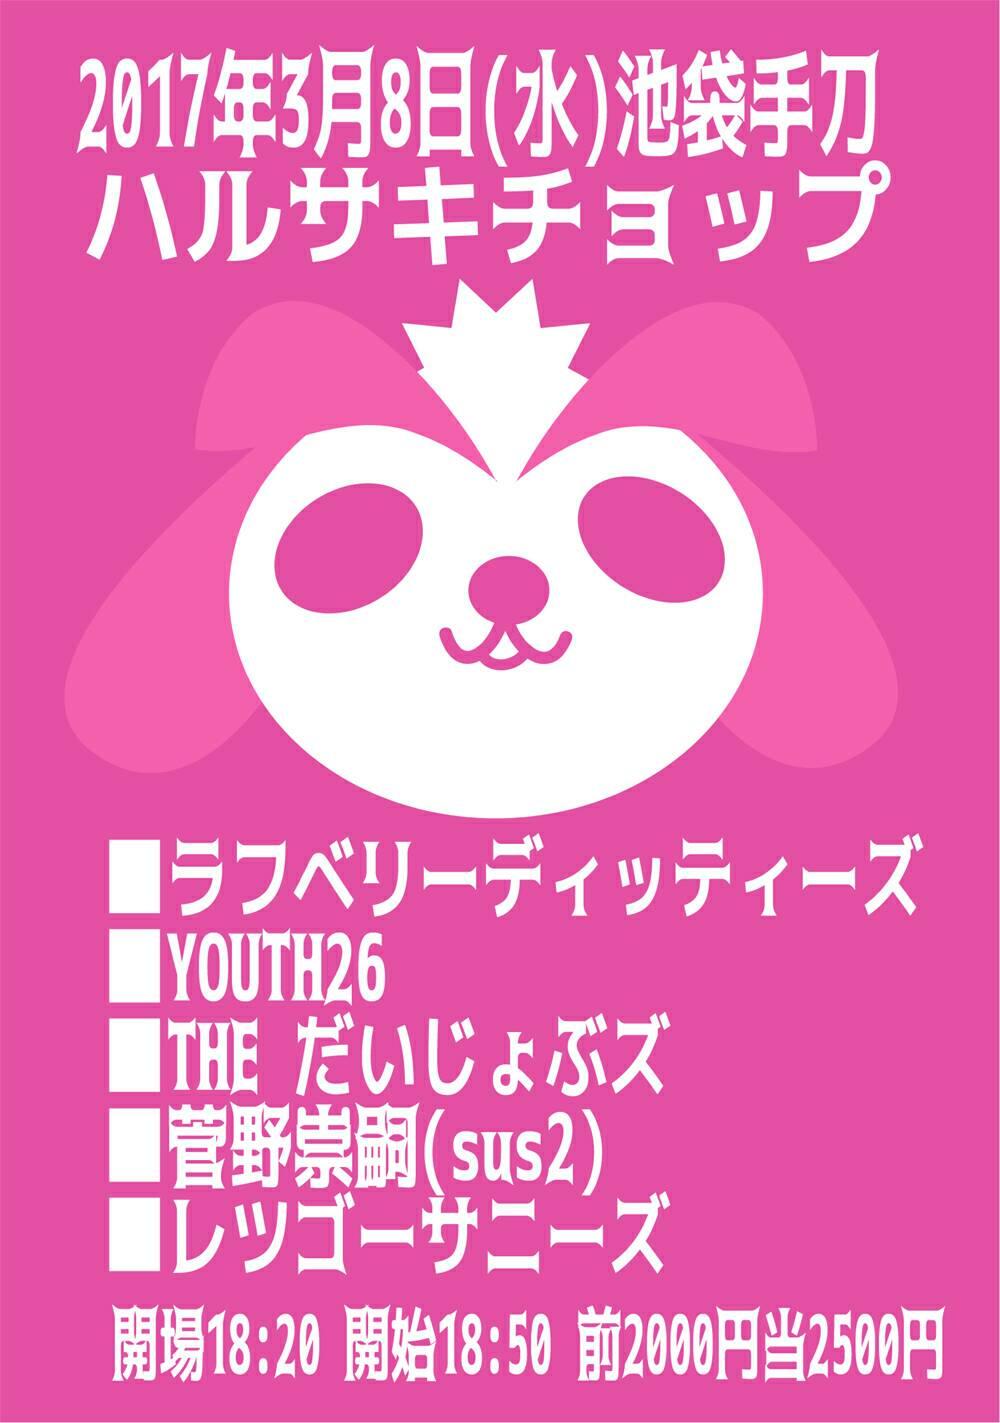 http://www.chop-tokyo.info/20170308f2.jpg